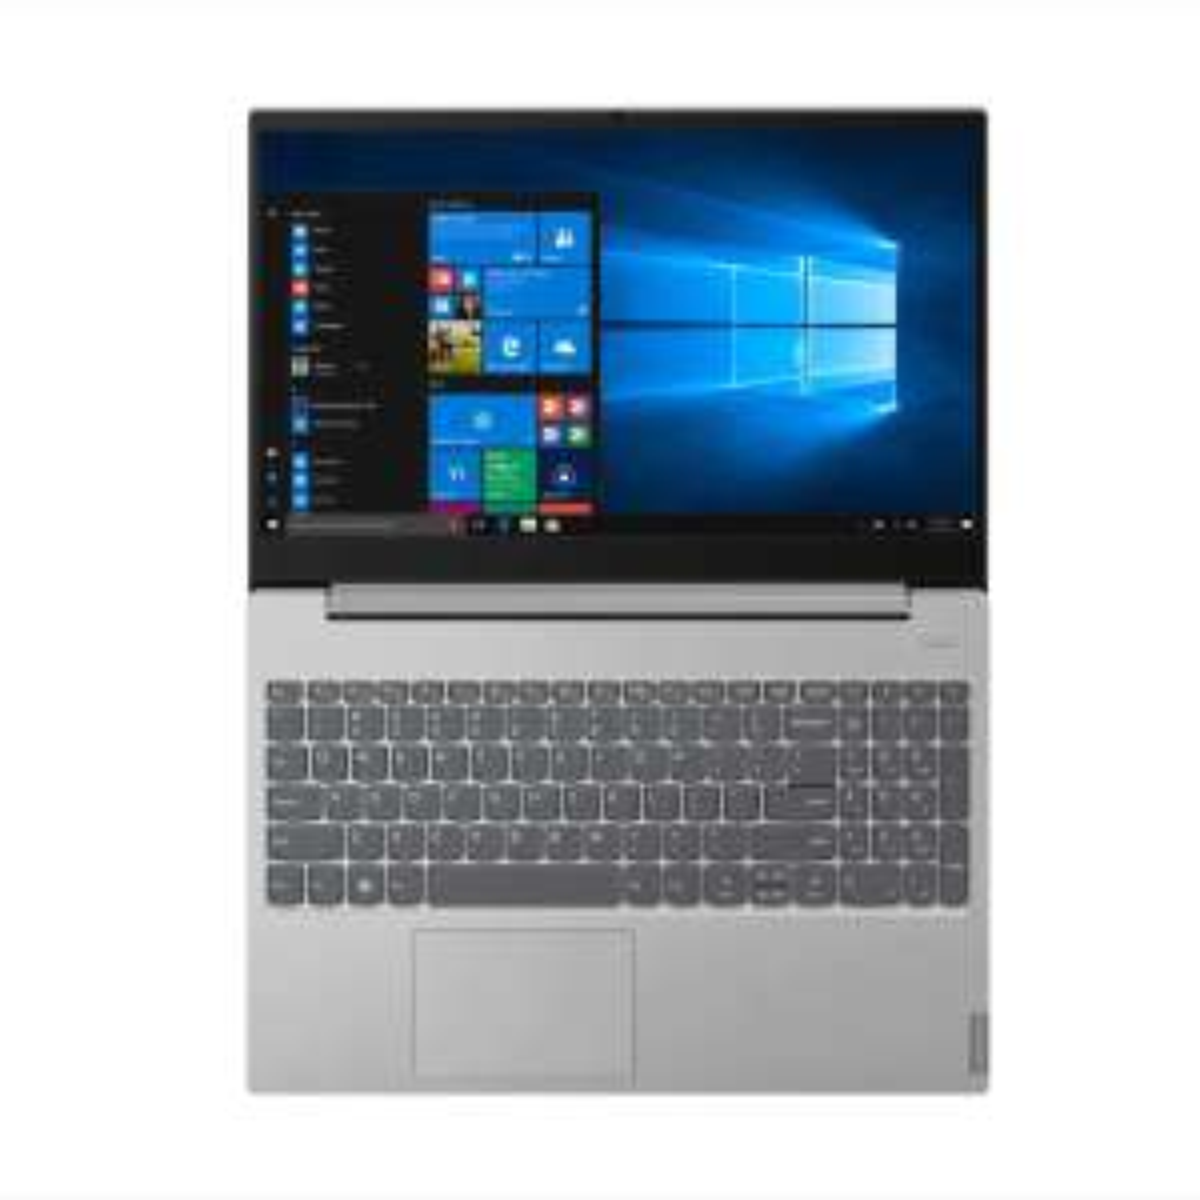 Sears: Paquete Laptop Lenovo S340-15Api Office 365 Personal